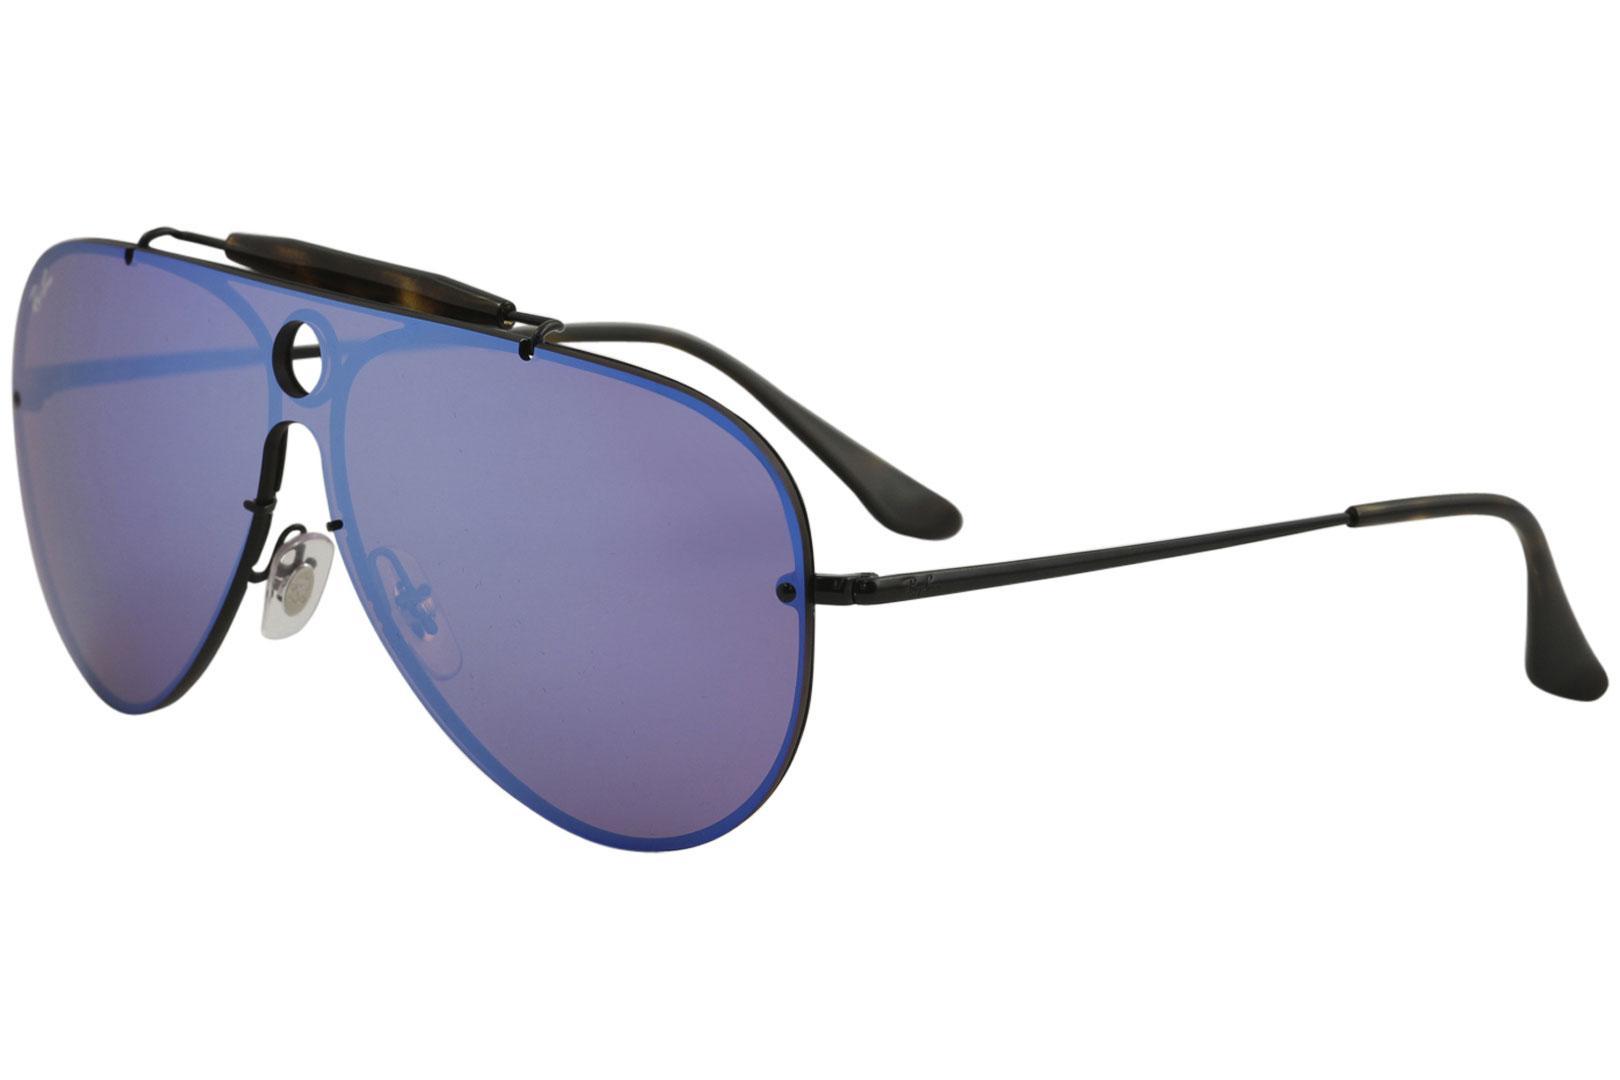 b3537c656b8eb Ray Ban Blaze Shooter RB3581N RB 3581 N RayBan Fashion Pilot Sunglasses